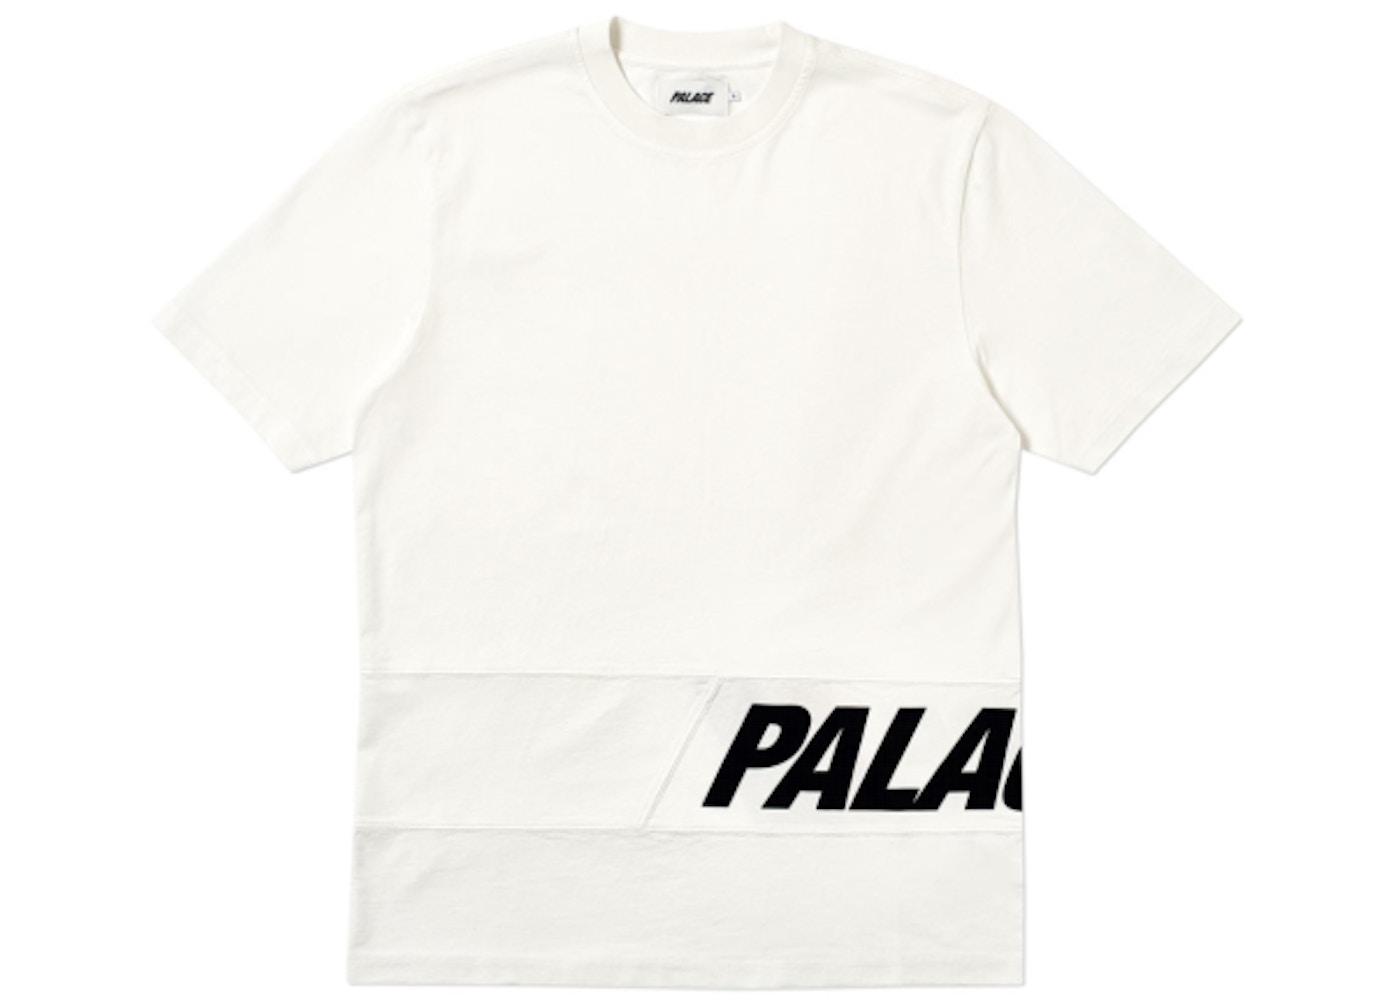 cbe2481fea9de Palace Side T-Shirt White - SS19